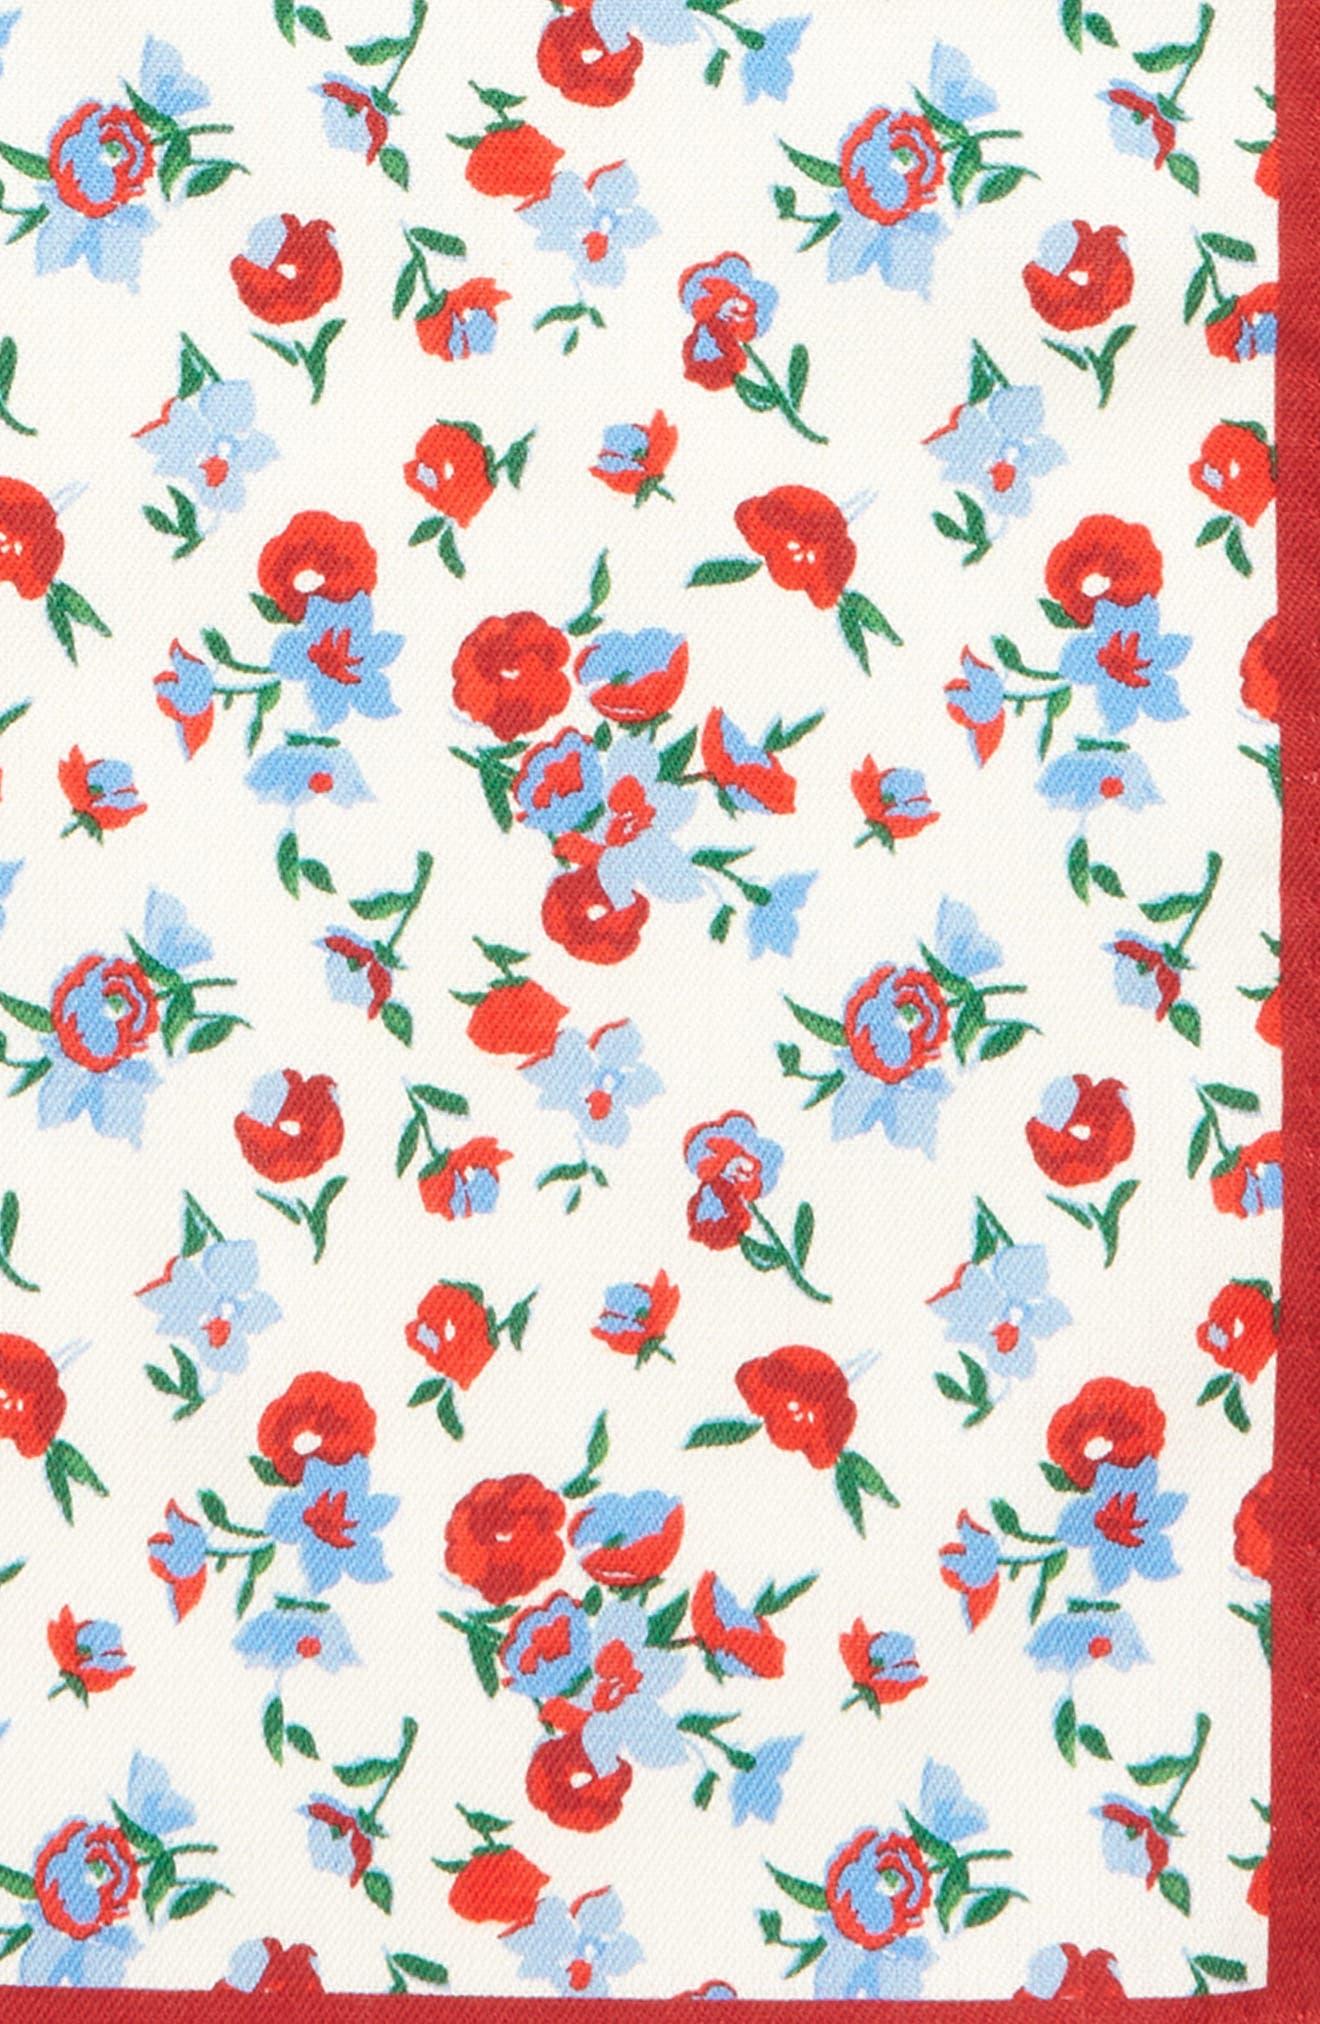 Floral Silk Pocket Square,                             Alternate thumbnail 3, color,                             RED